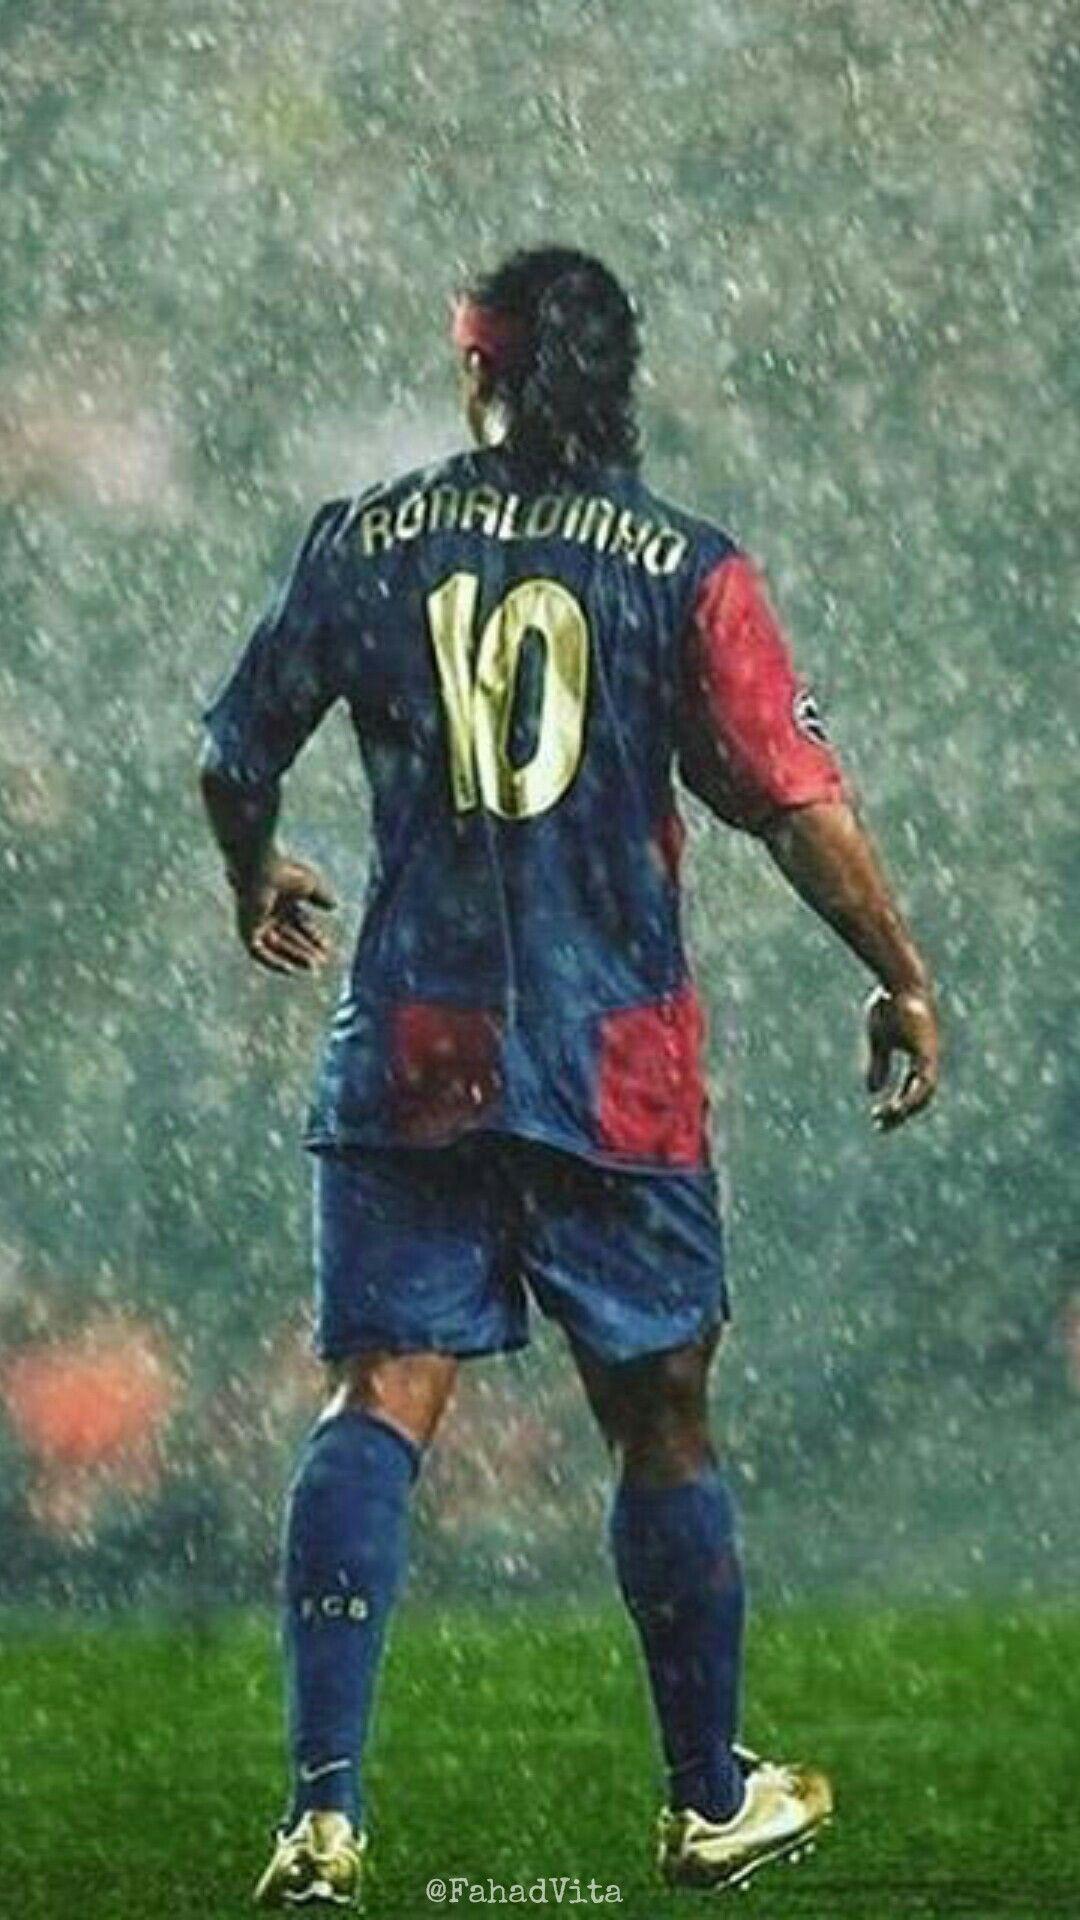 Ronaldinho Wallpapers Top Free Ronaldinho Backgrounds Wallpaperaccess